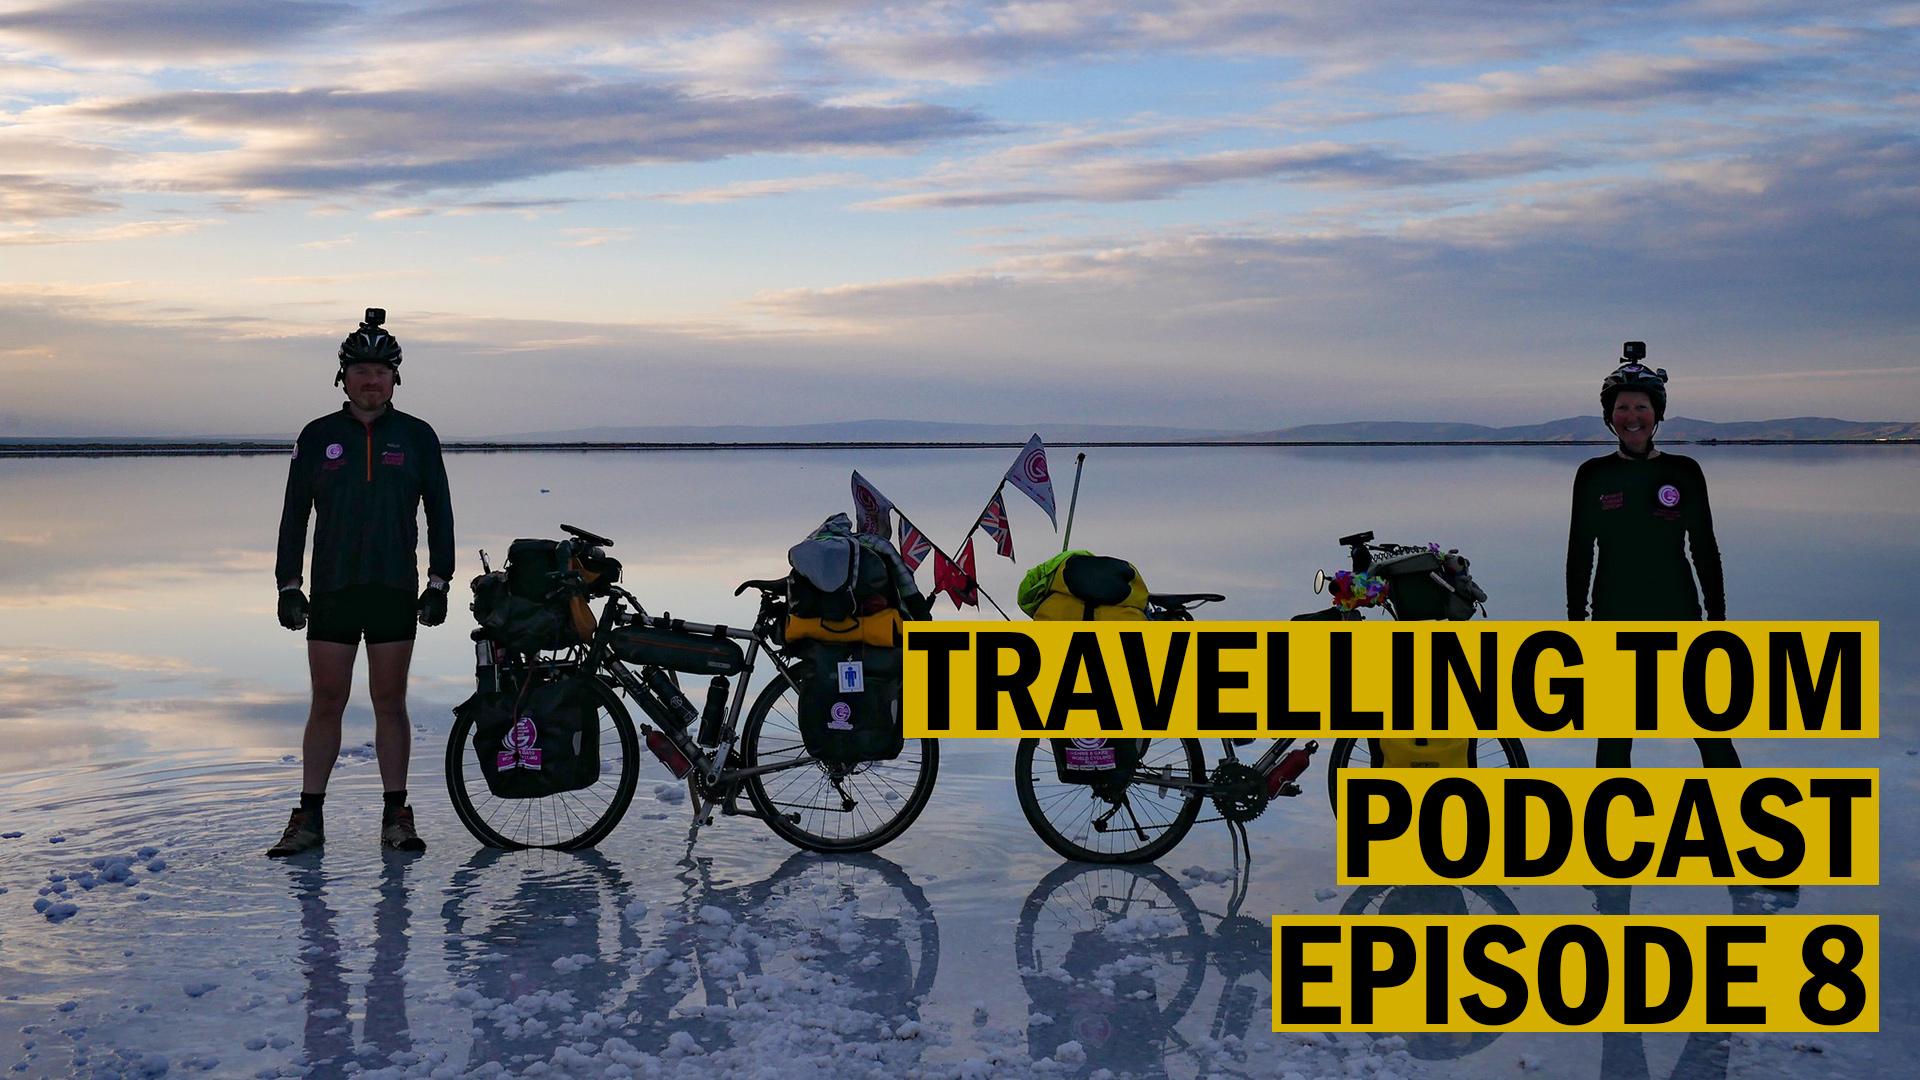 Chris and Gabs pose with their bikes at Tuz Salt Lake in Turkey. Image credit:    Chris & Gabs World Cycling Tour   /   Flickr